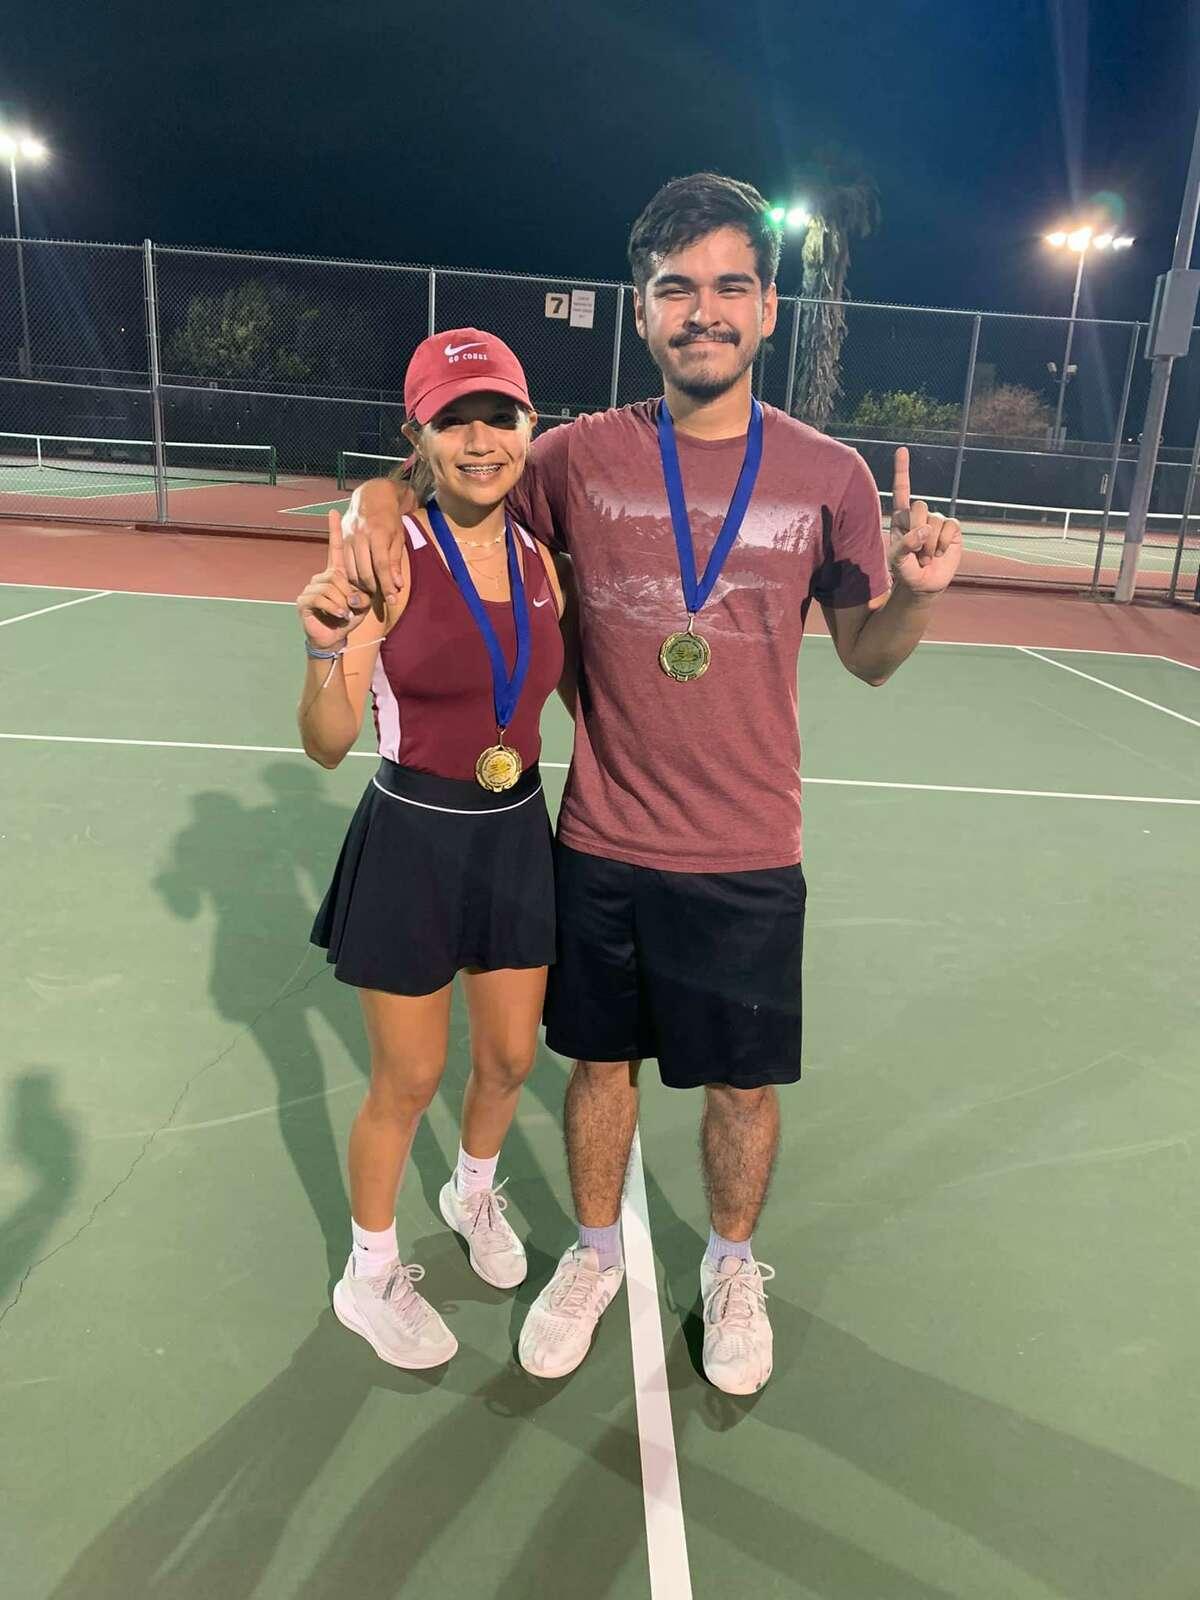 Mixed Open Doubles Champions Jocelynn Arellano and Jerry Beltran